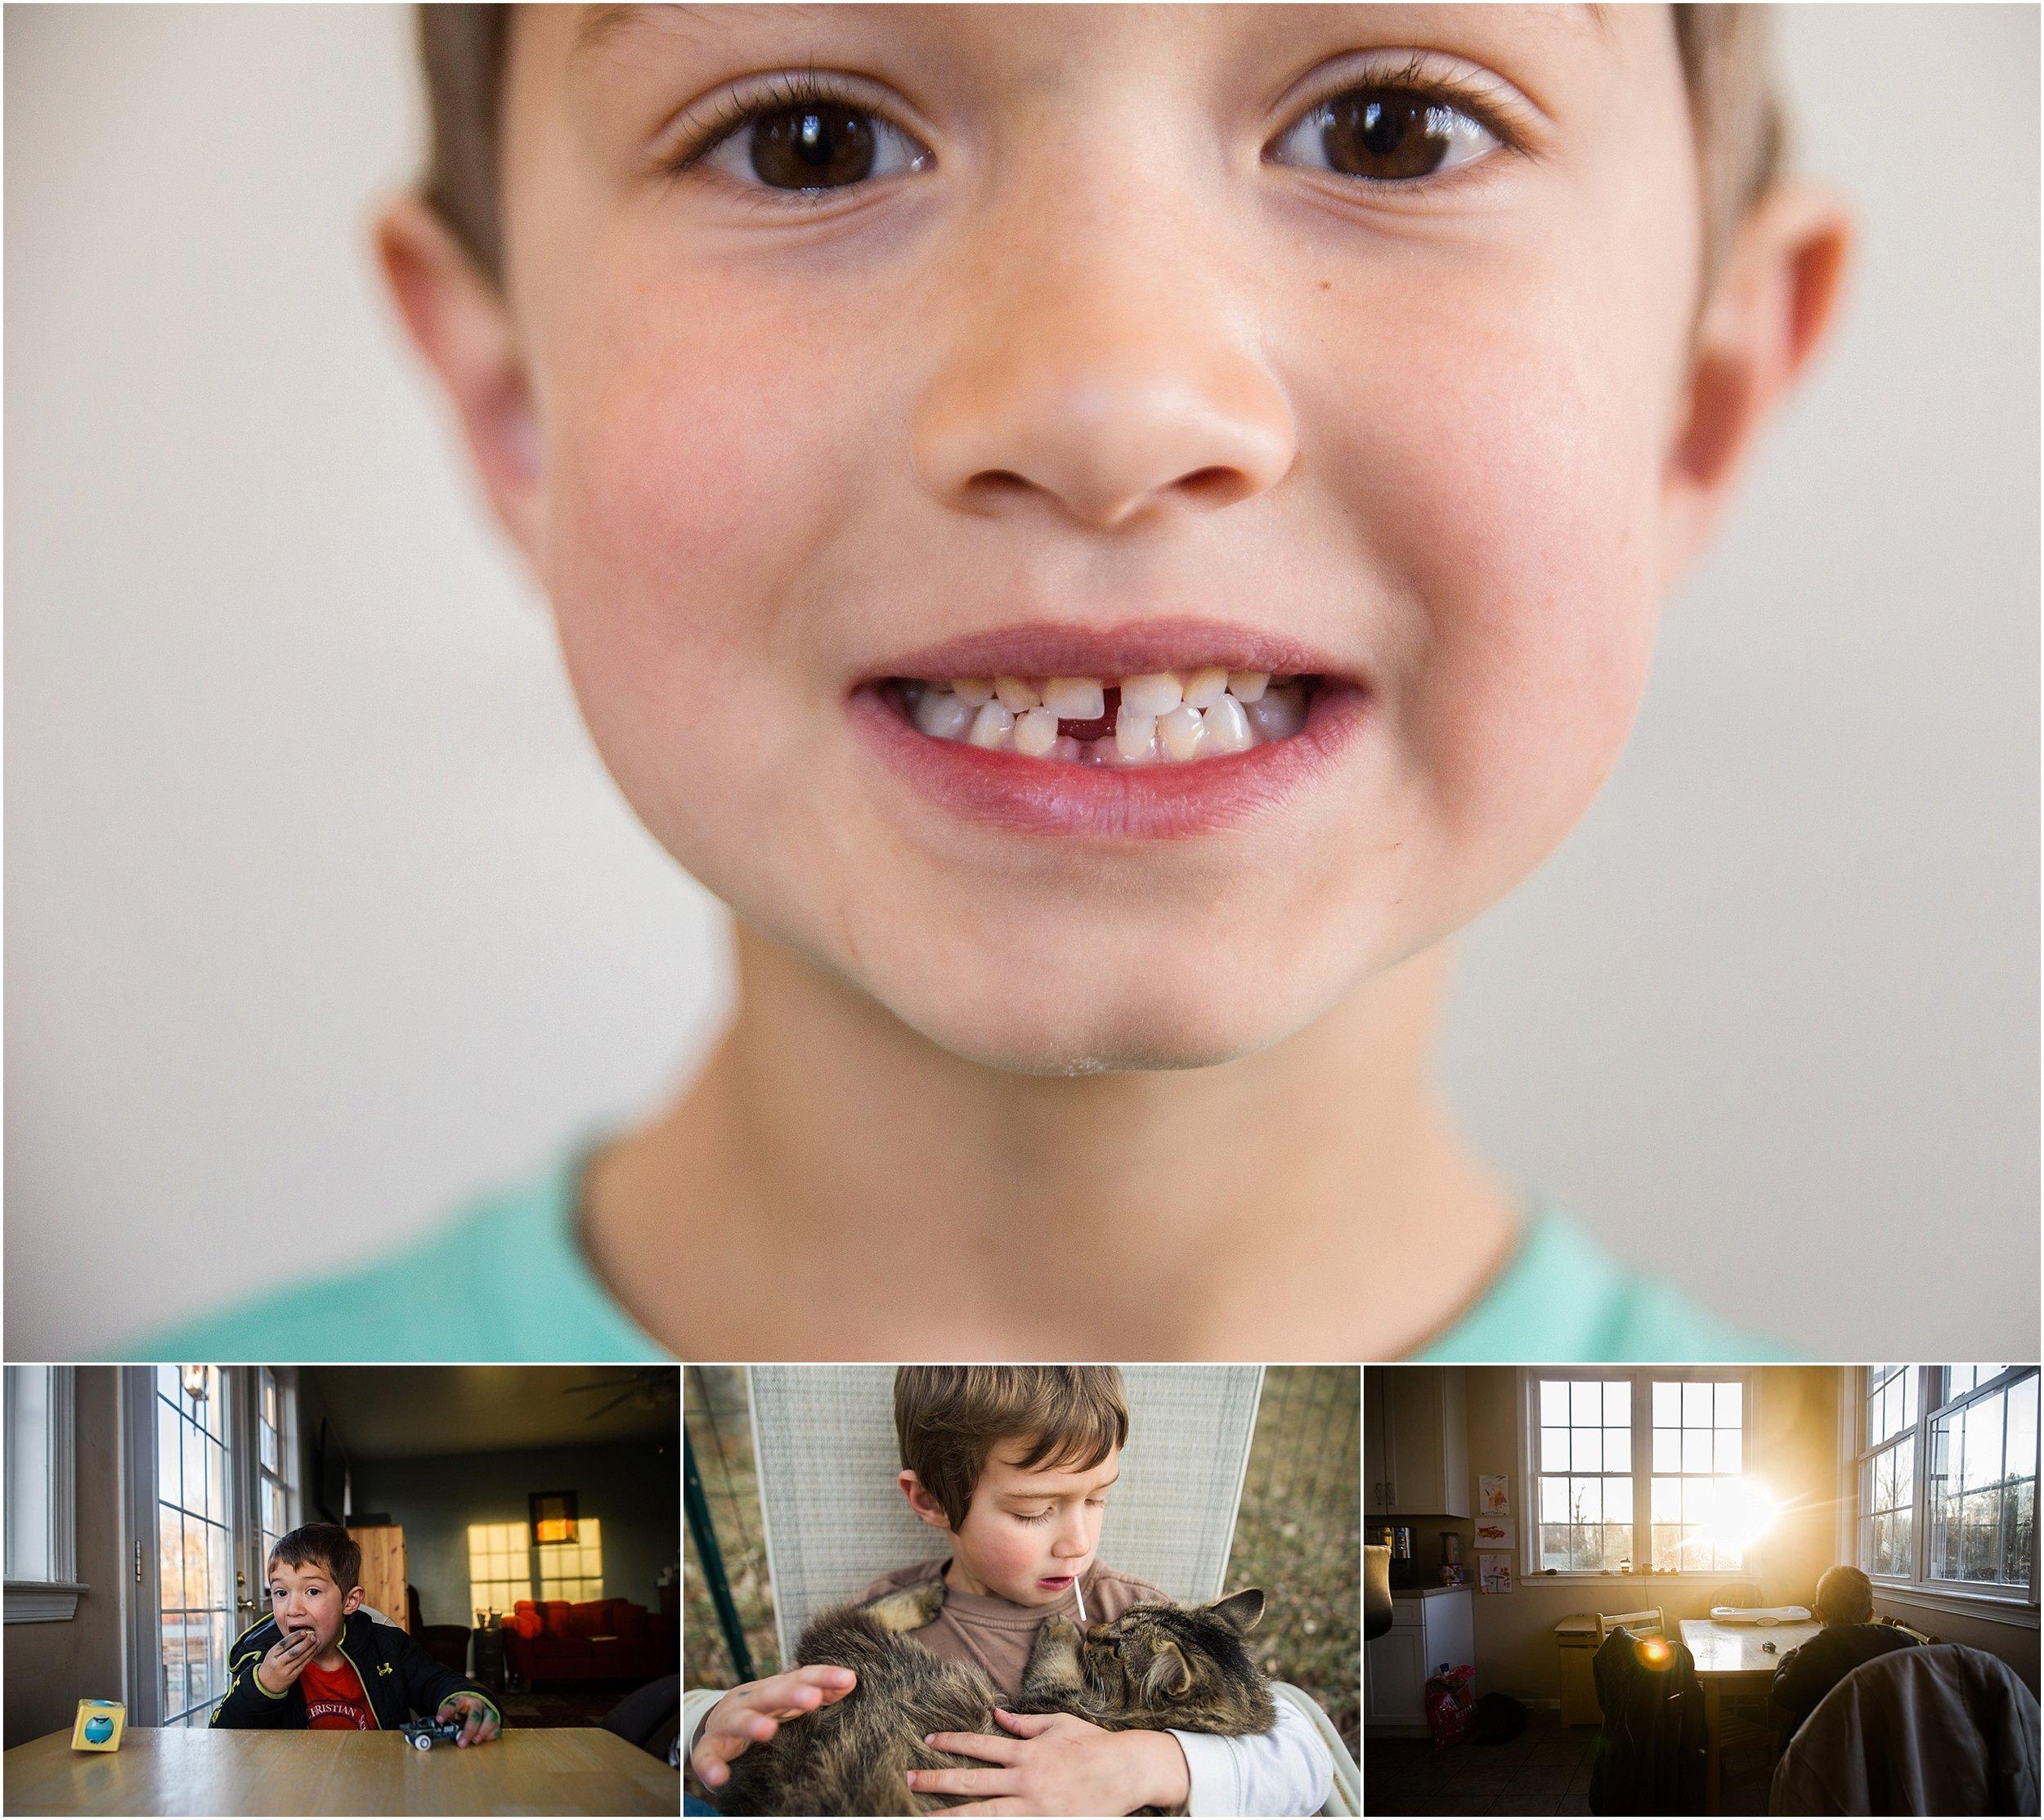 lost tooth kitten boy Holli Pool Photography Stuarts Draft Virginia